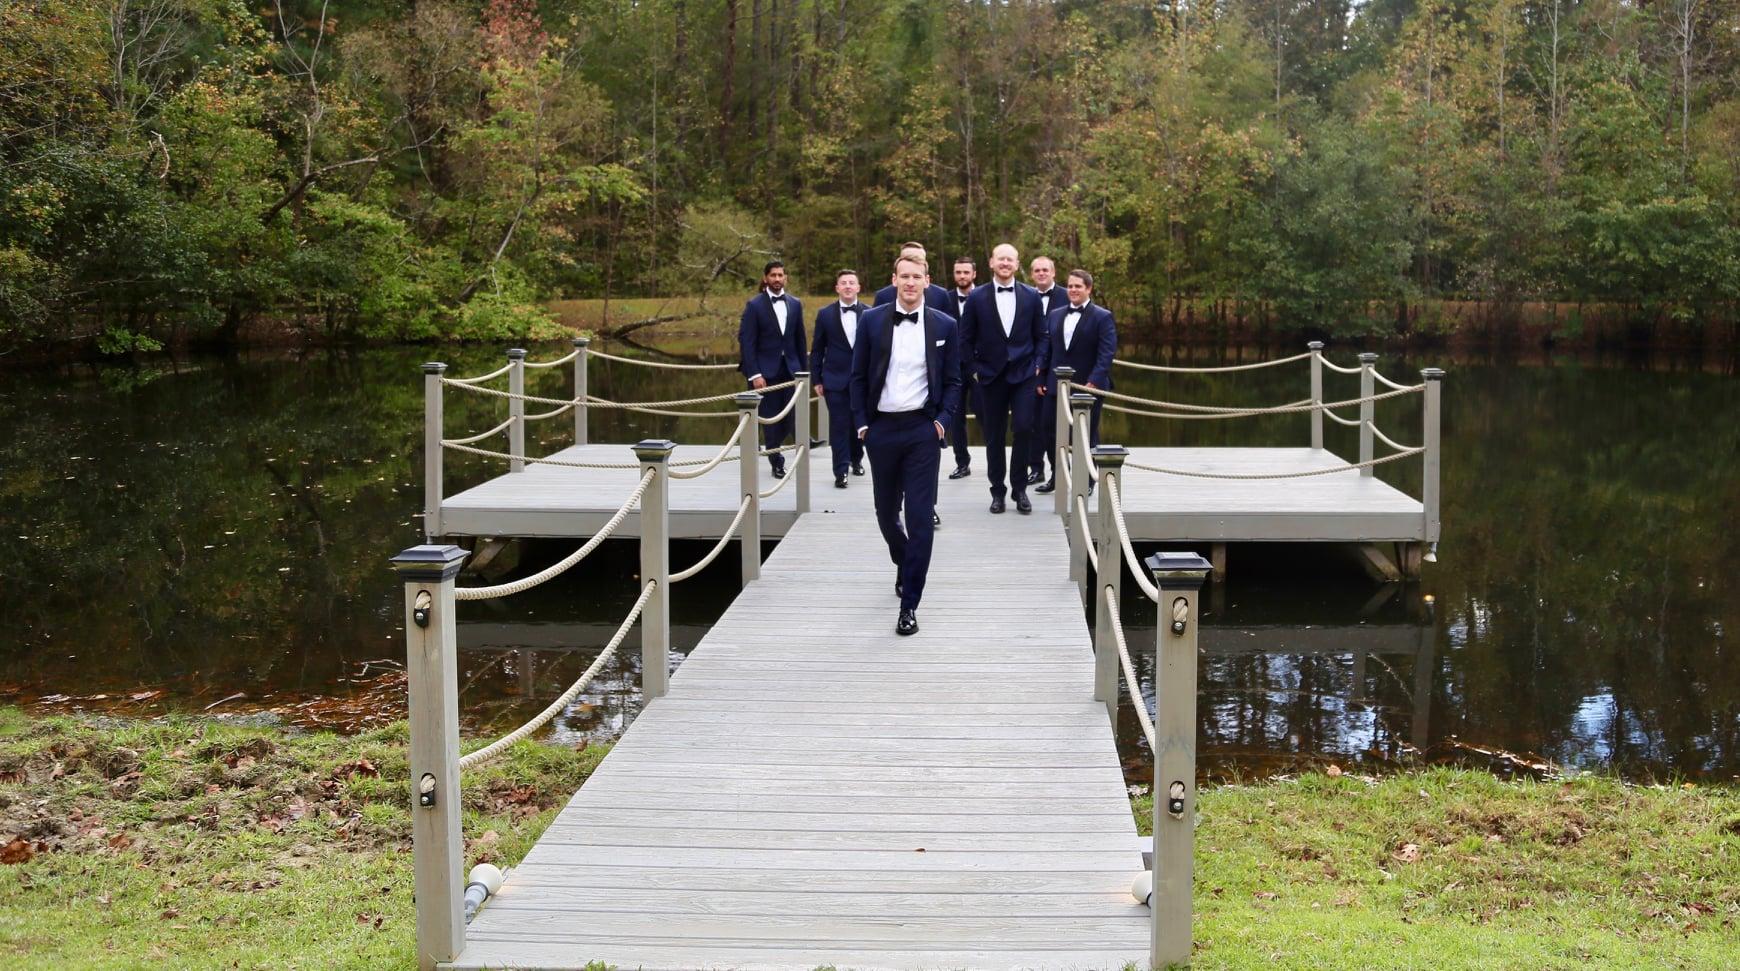 groom men photo inspo outdoor farm wedding, lake wedding